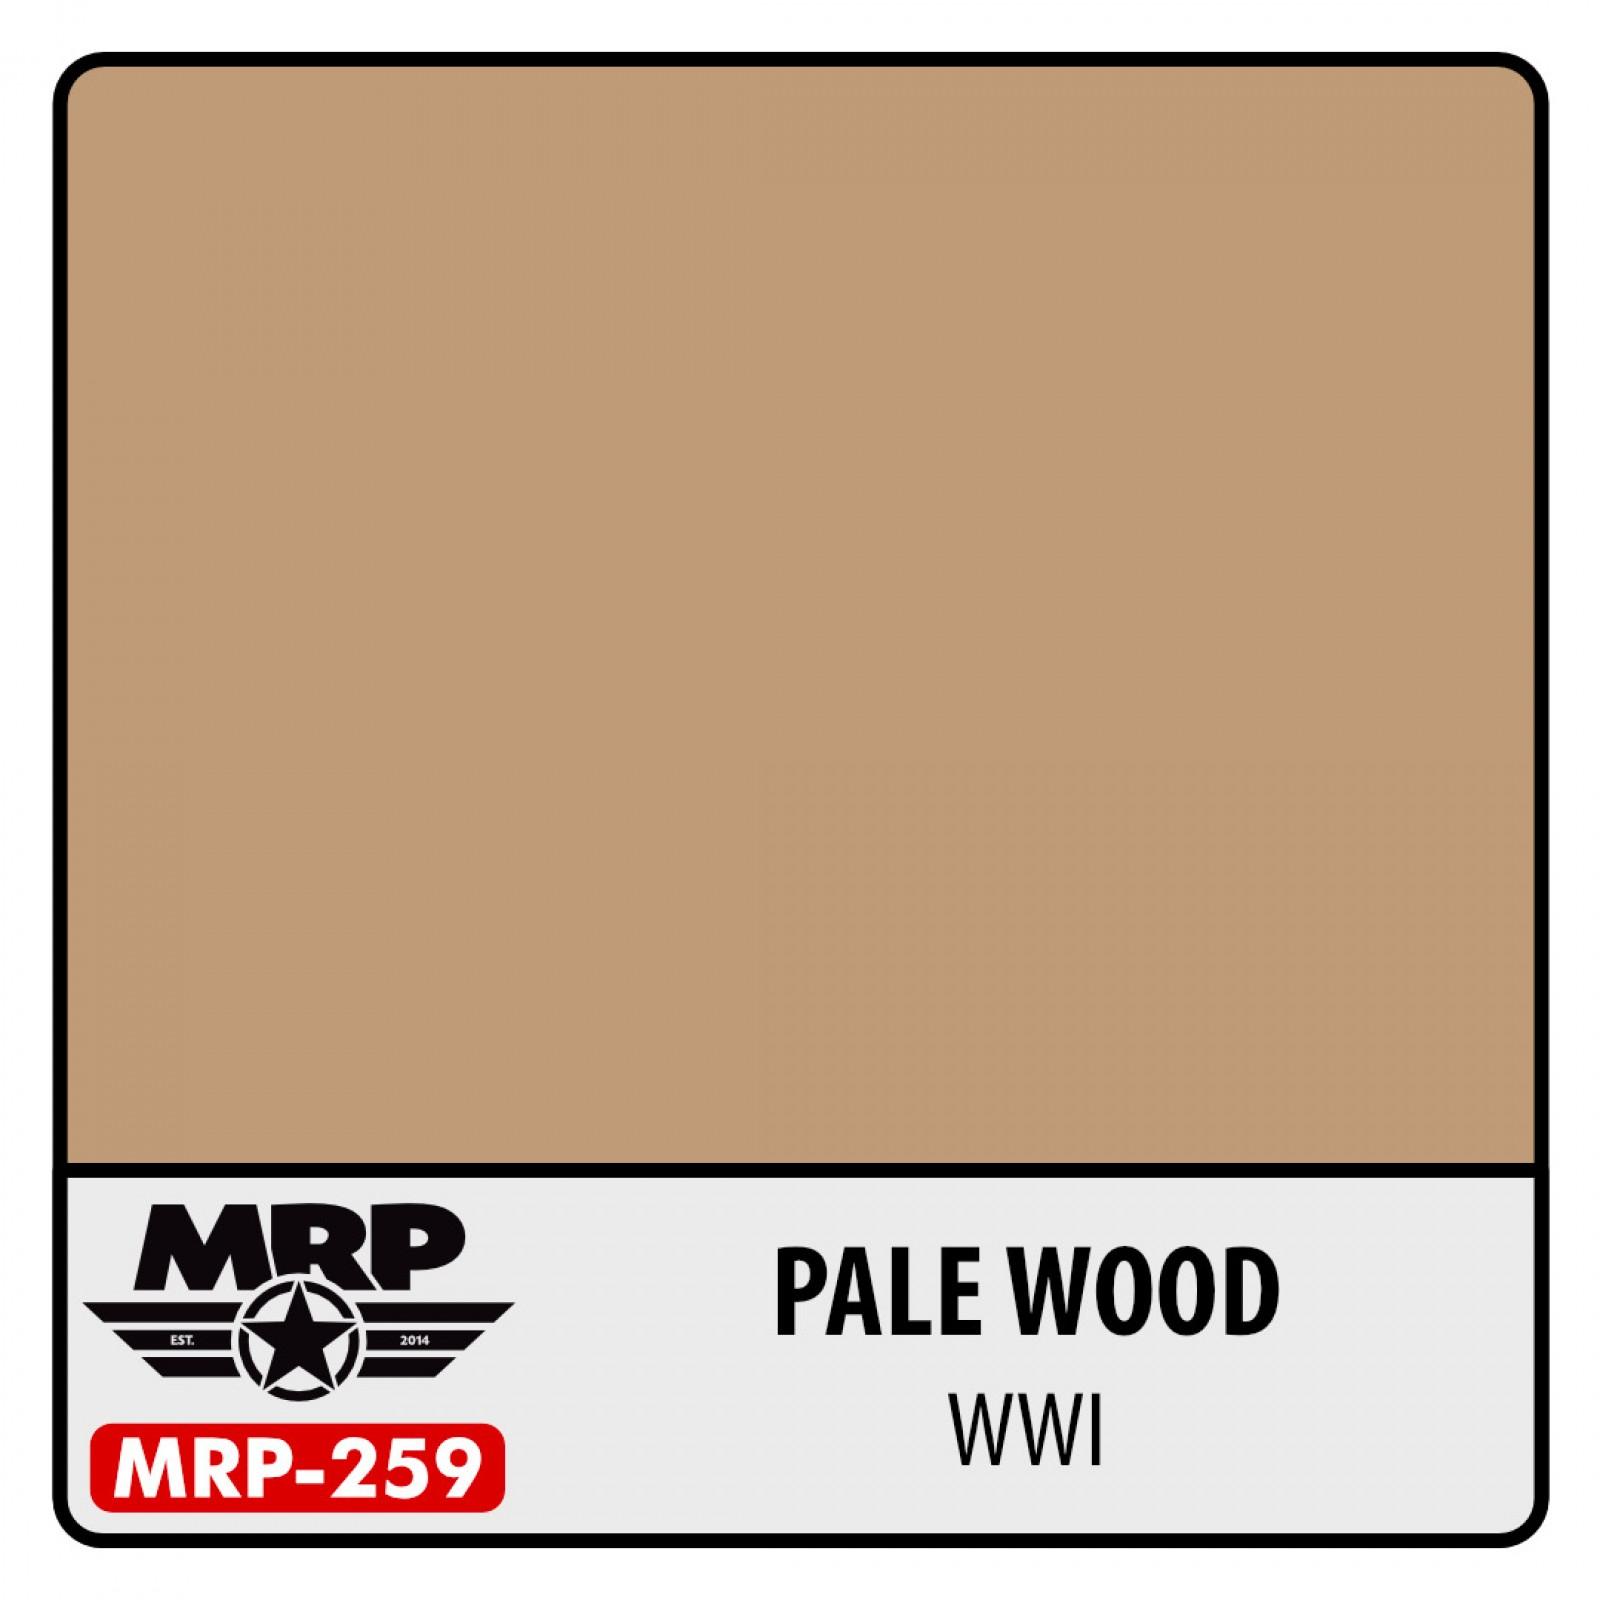 MRP-259    PALE WOOD